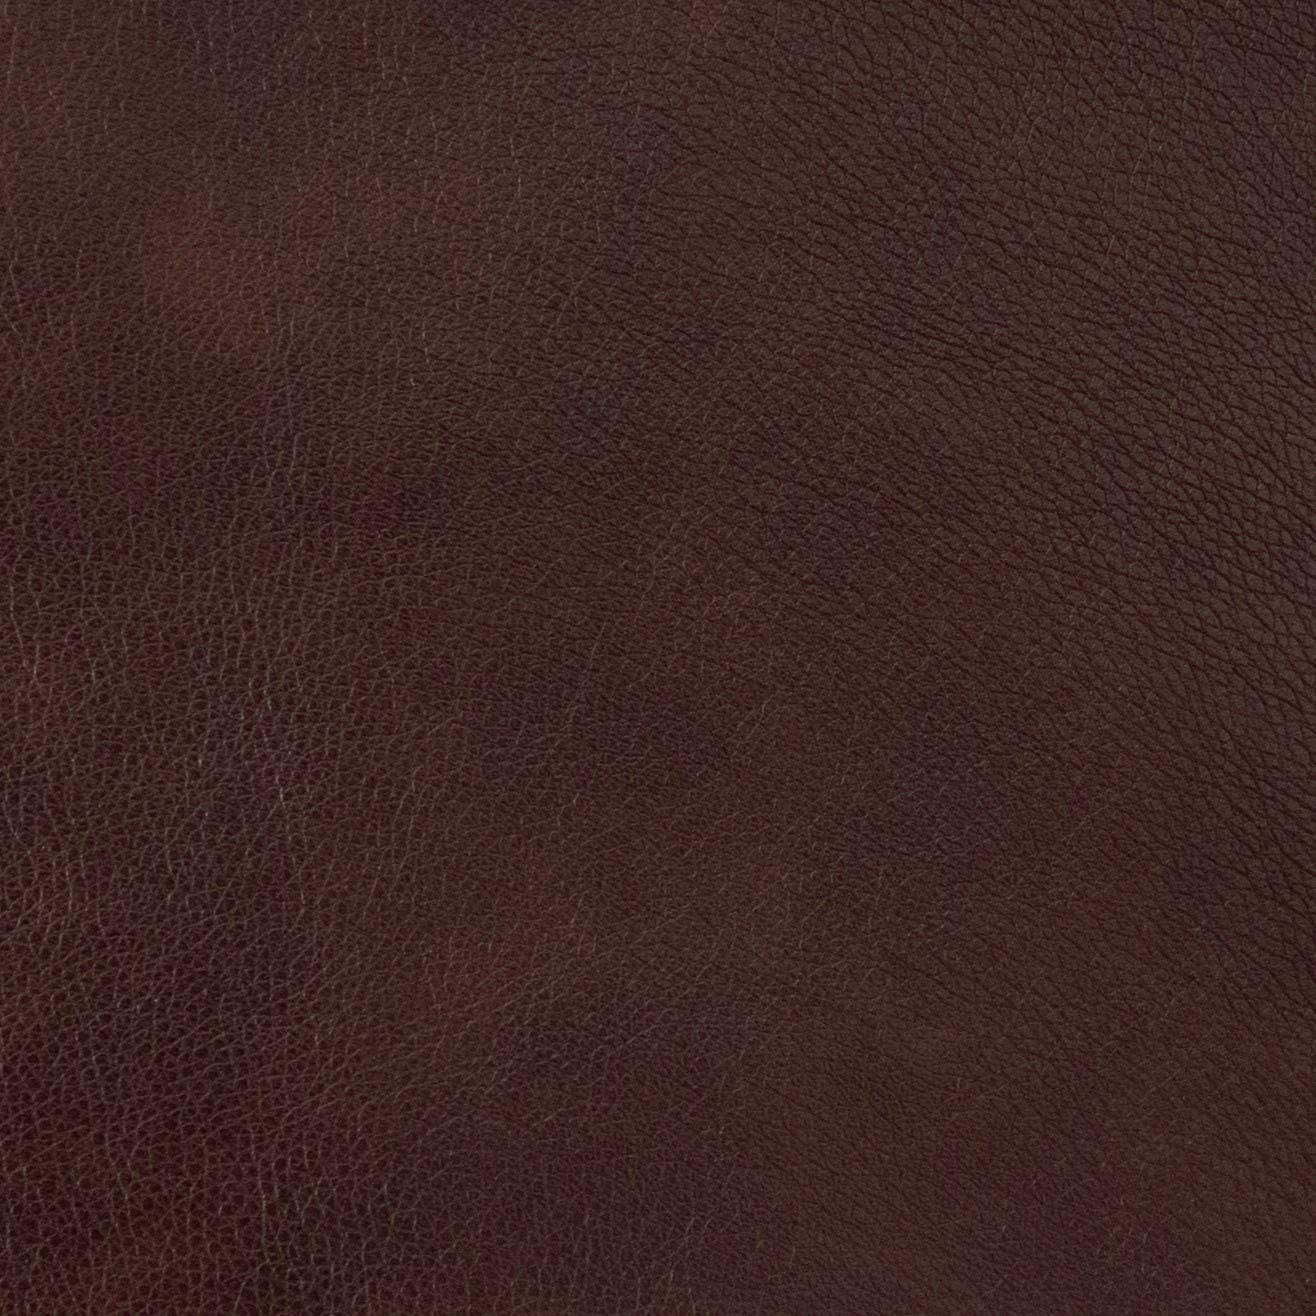 THOMAS PAYNE 358482 Momentum Series Jaleco Chocolate Center Console